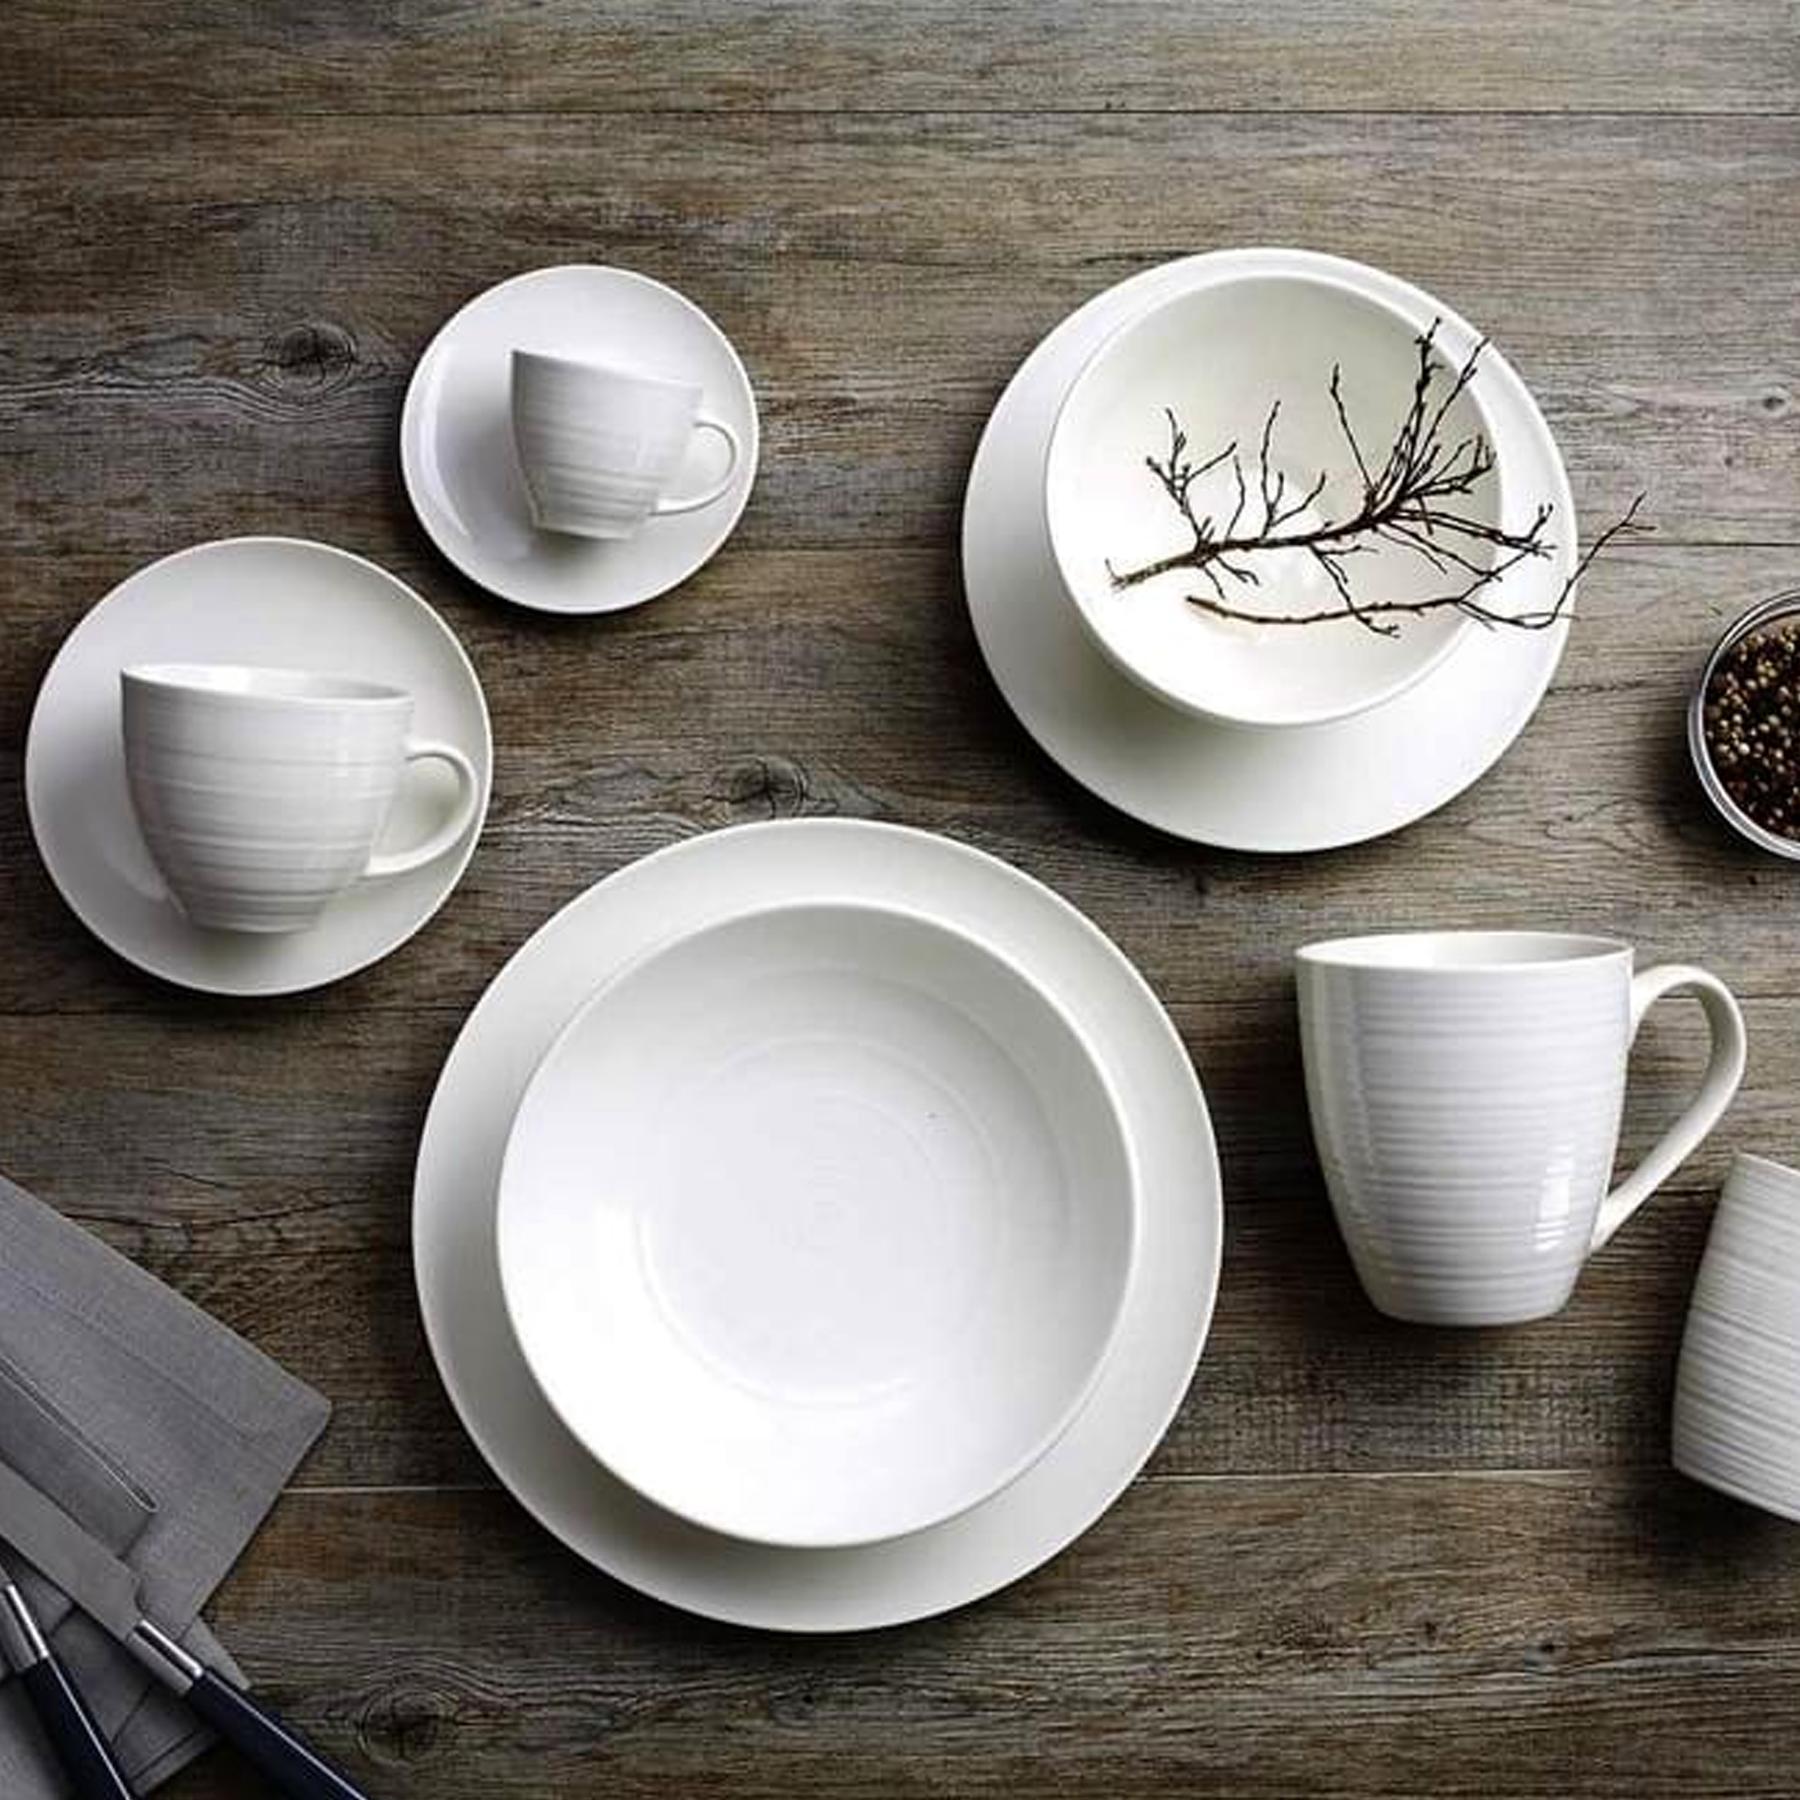 Ritzenhoff Geschirr Set Weiss Geschirrset Porzellan Schlicht